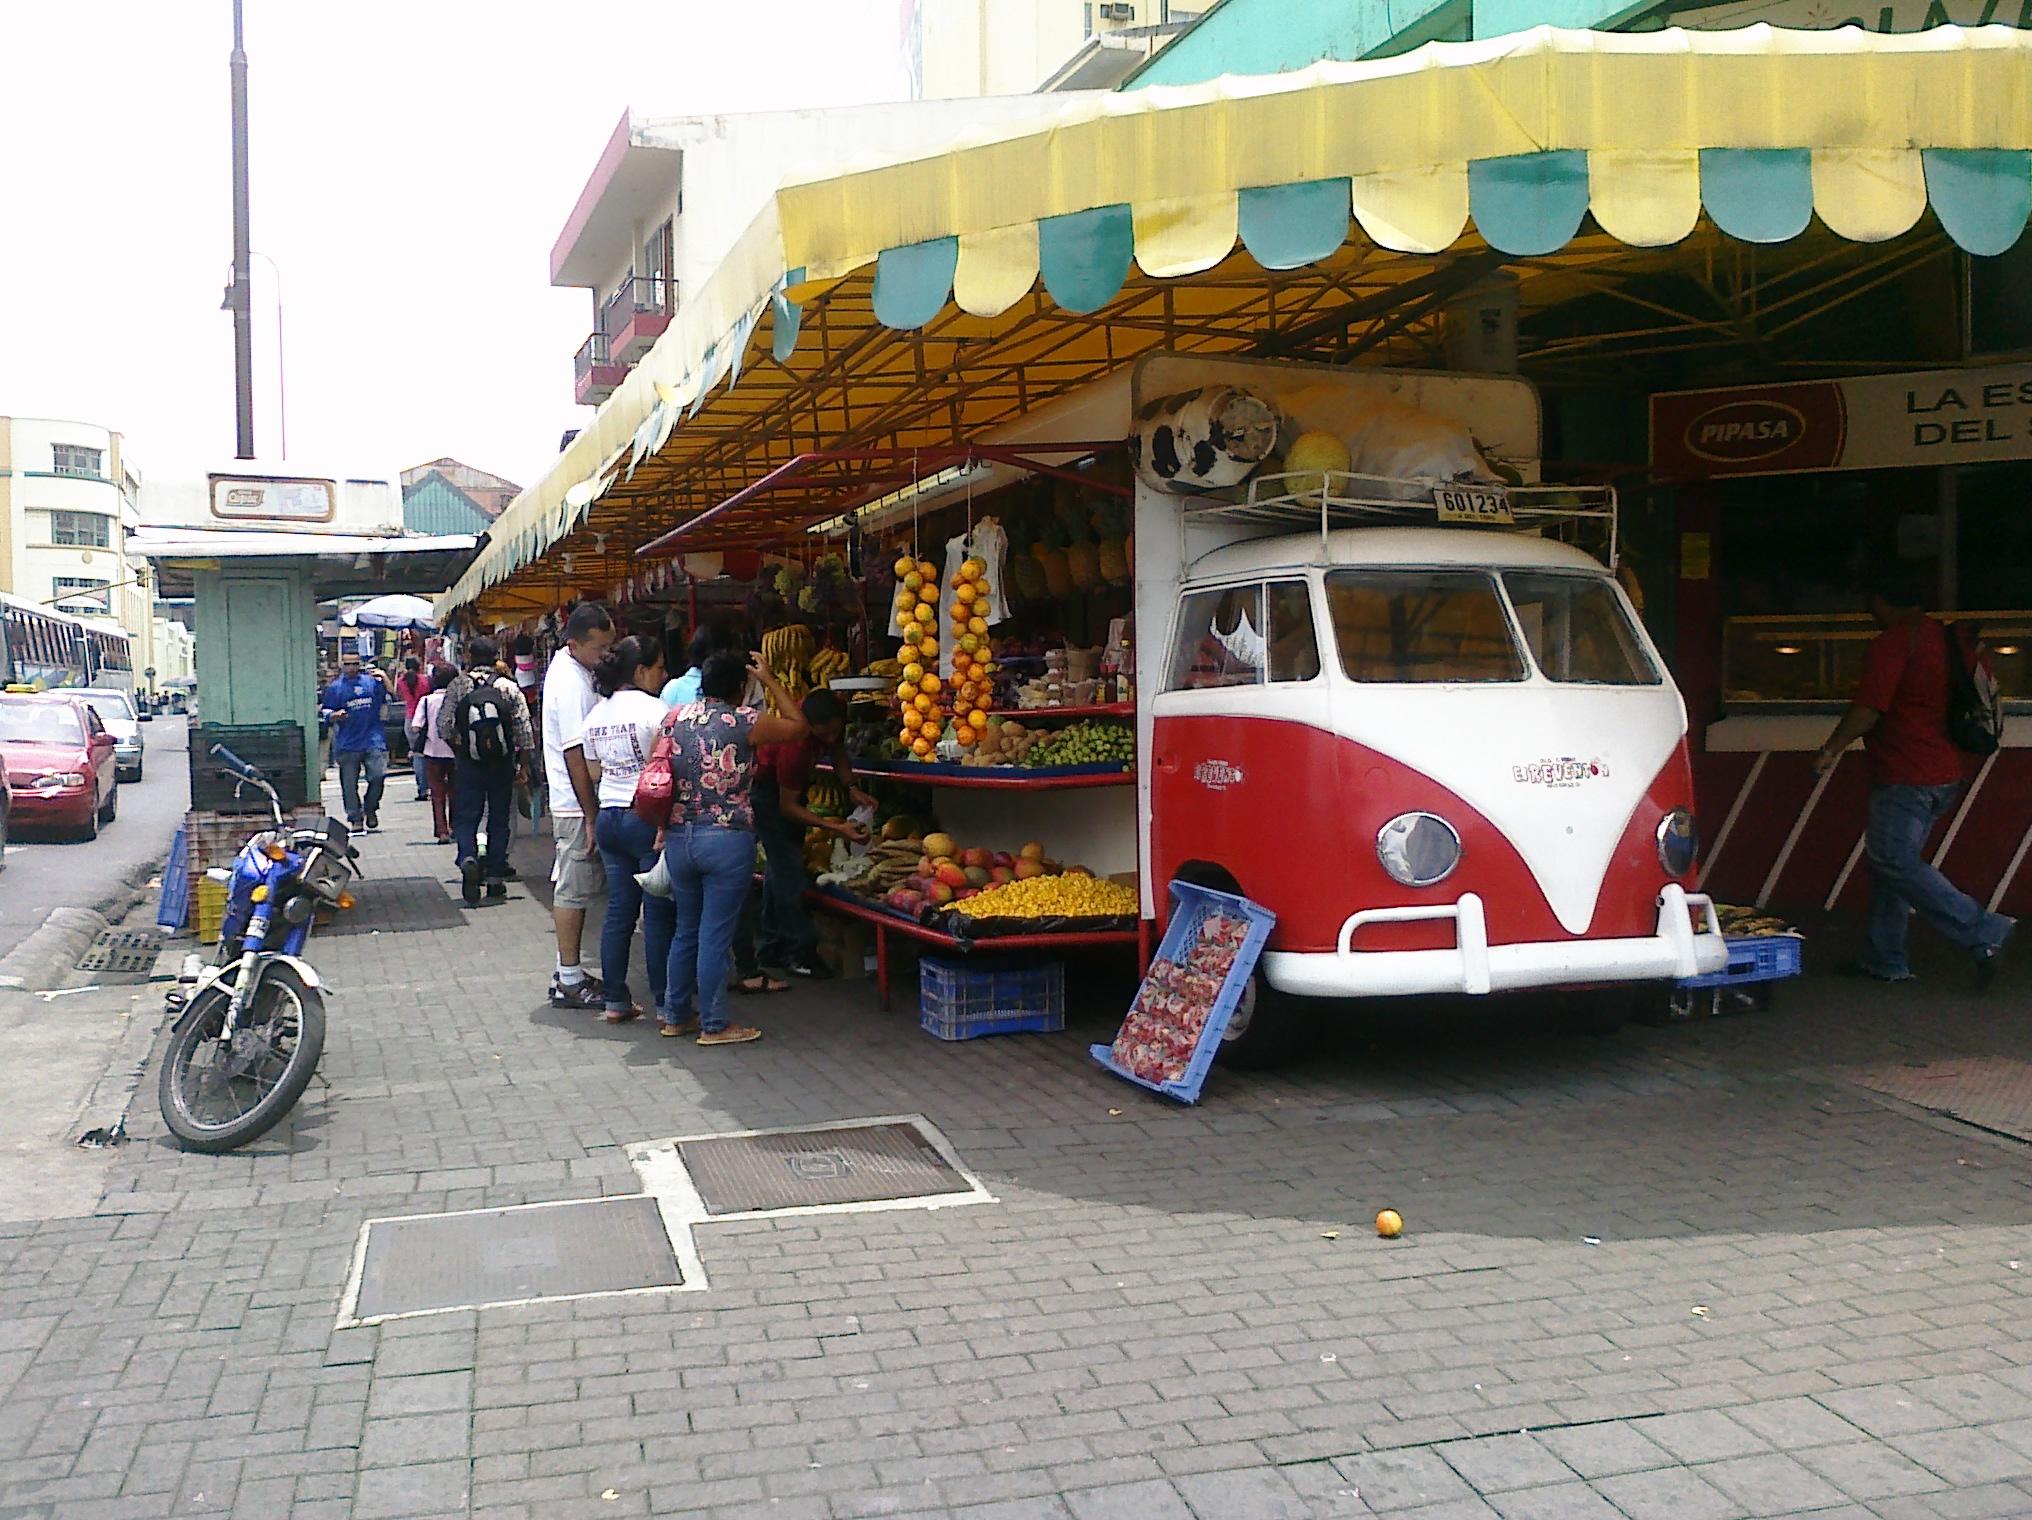 Street Market in San Jose, Costa Rica